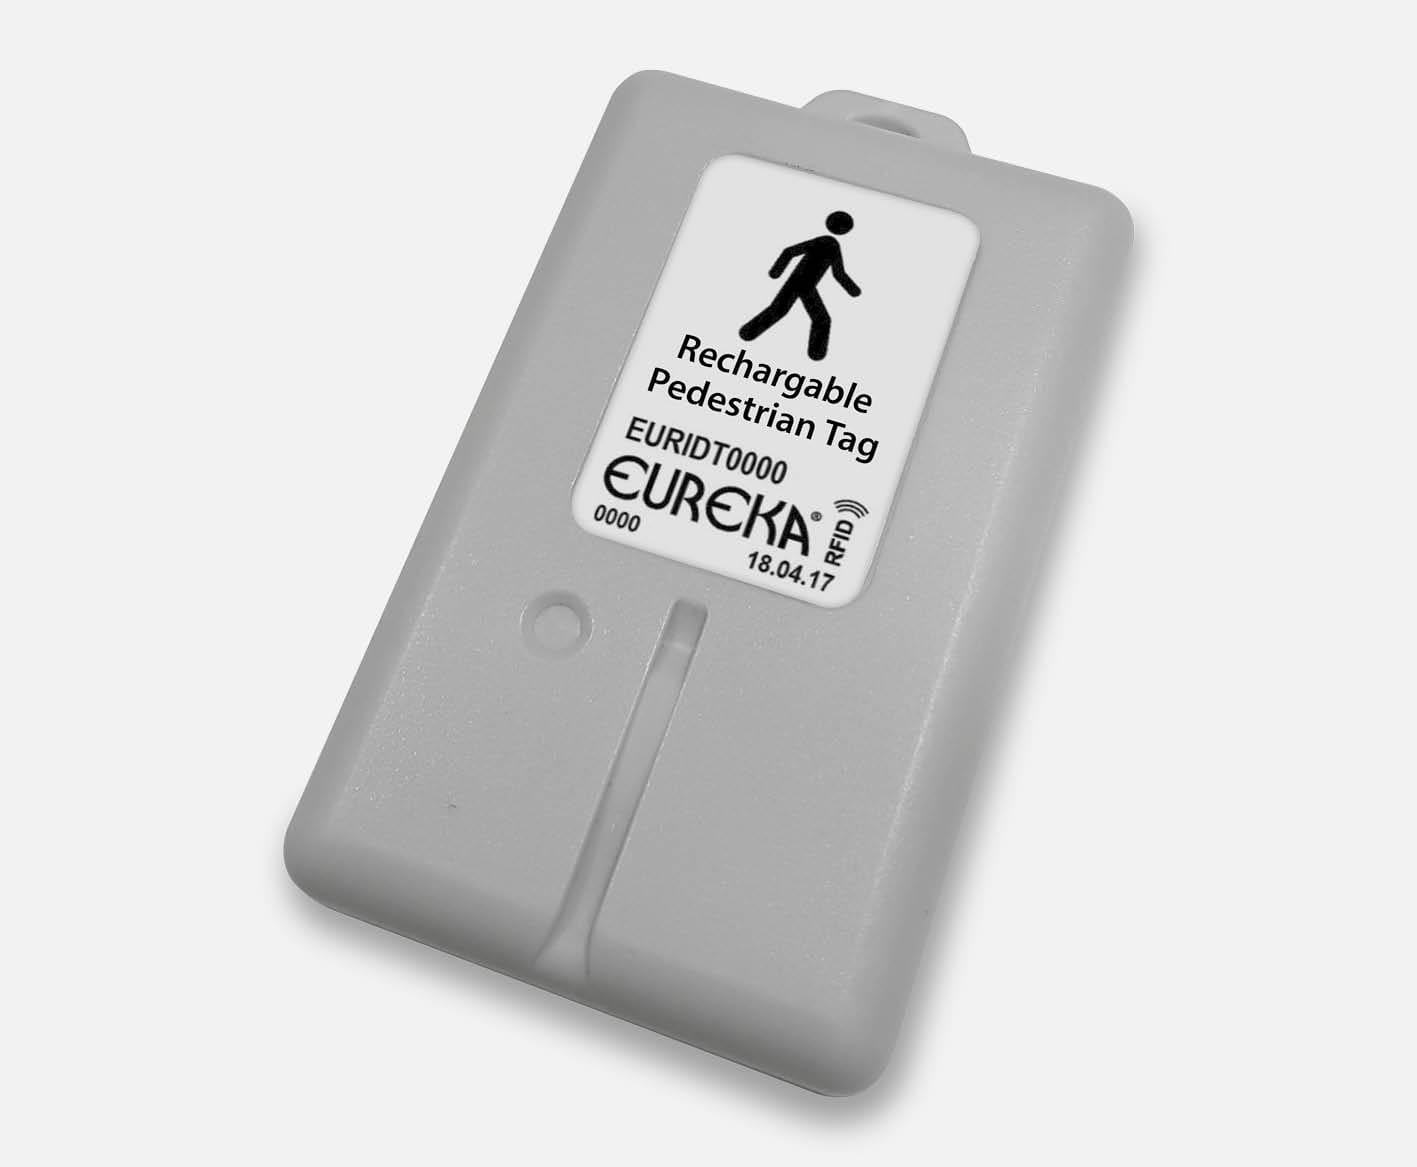 Pedestrian Safety Tag